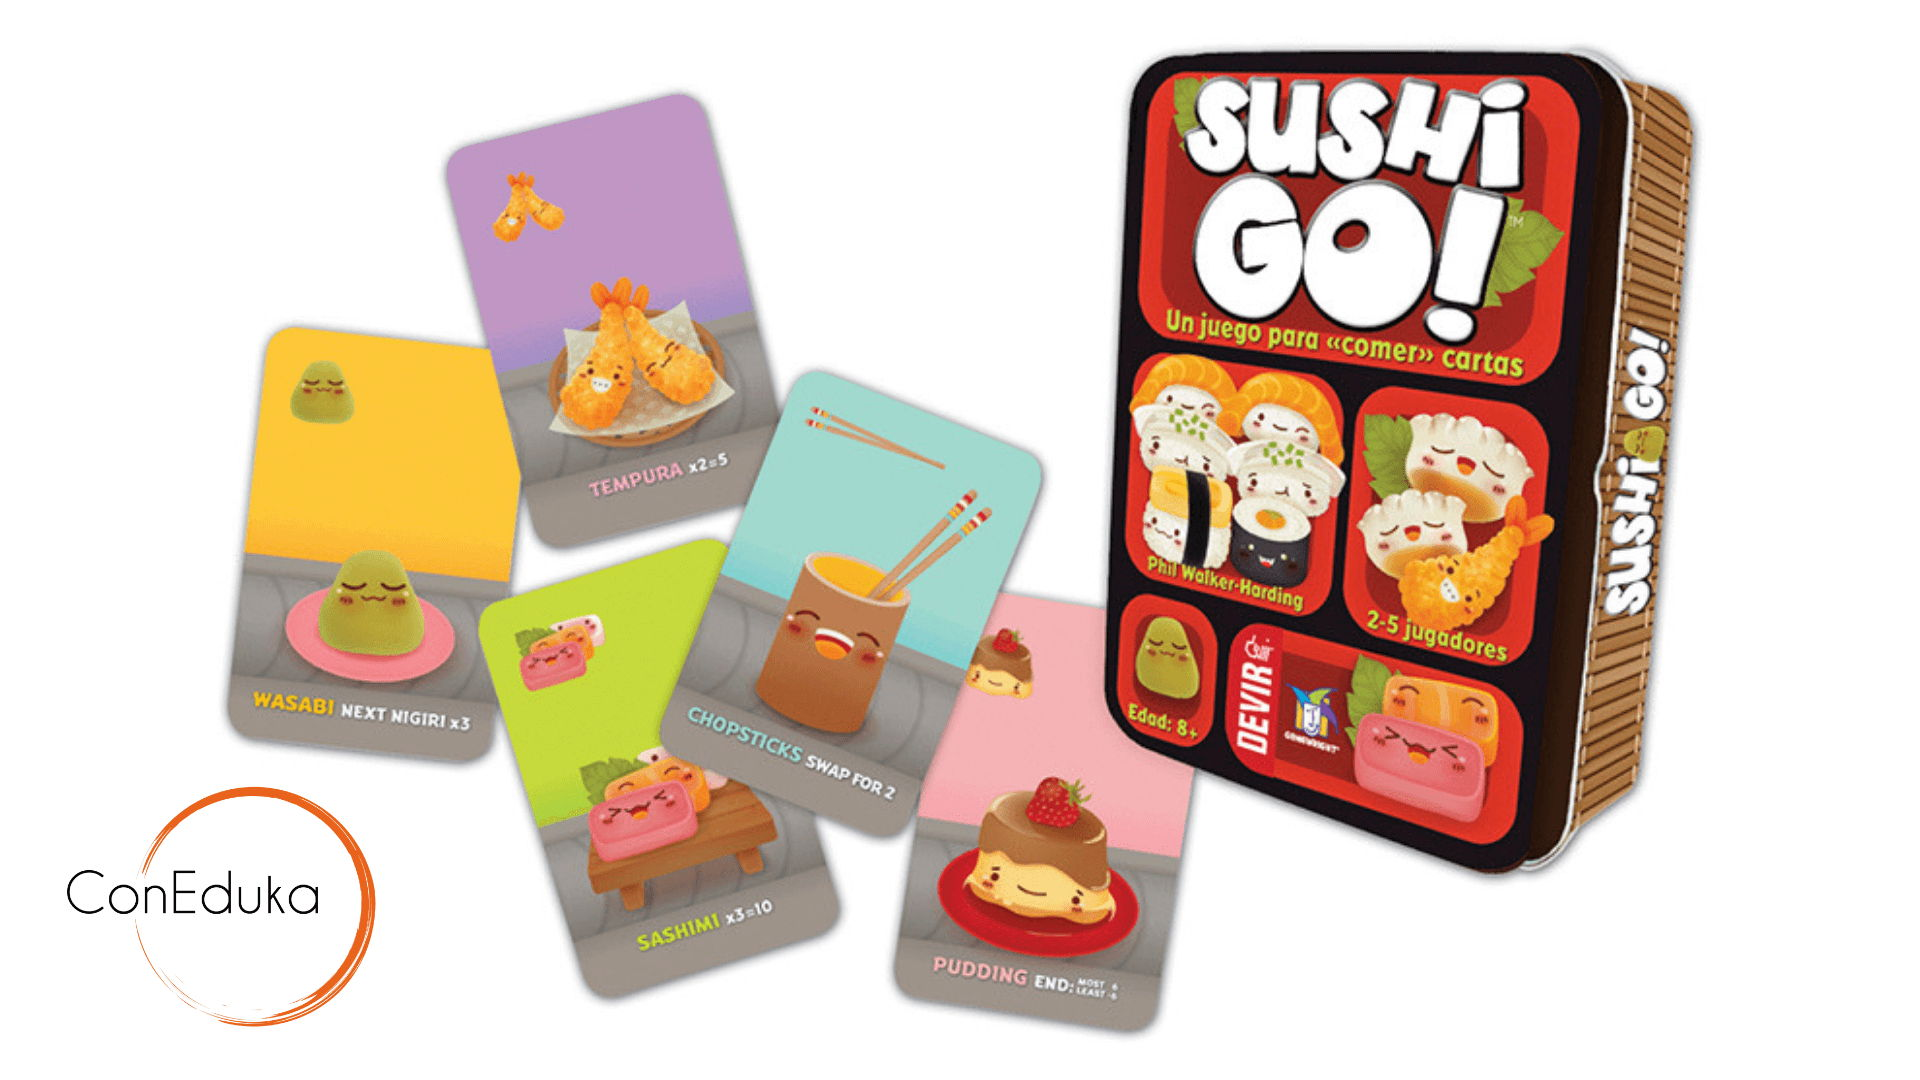 Sushi Go! juego